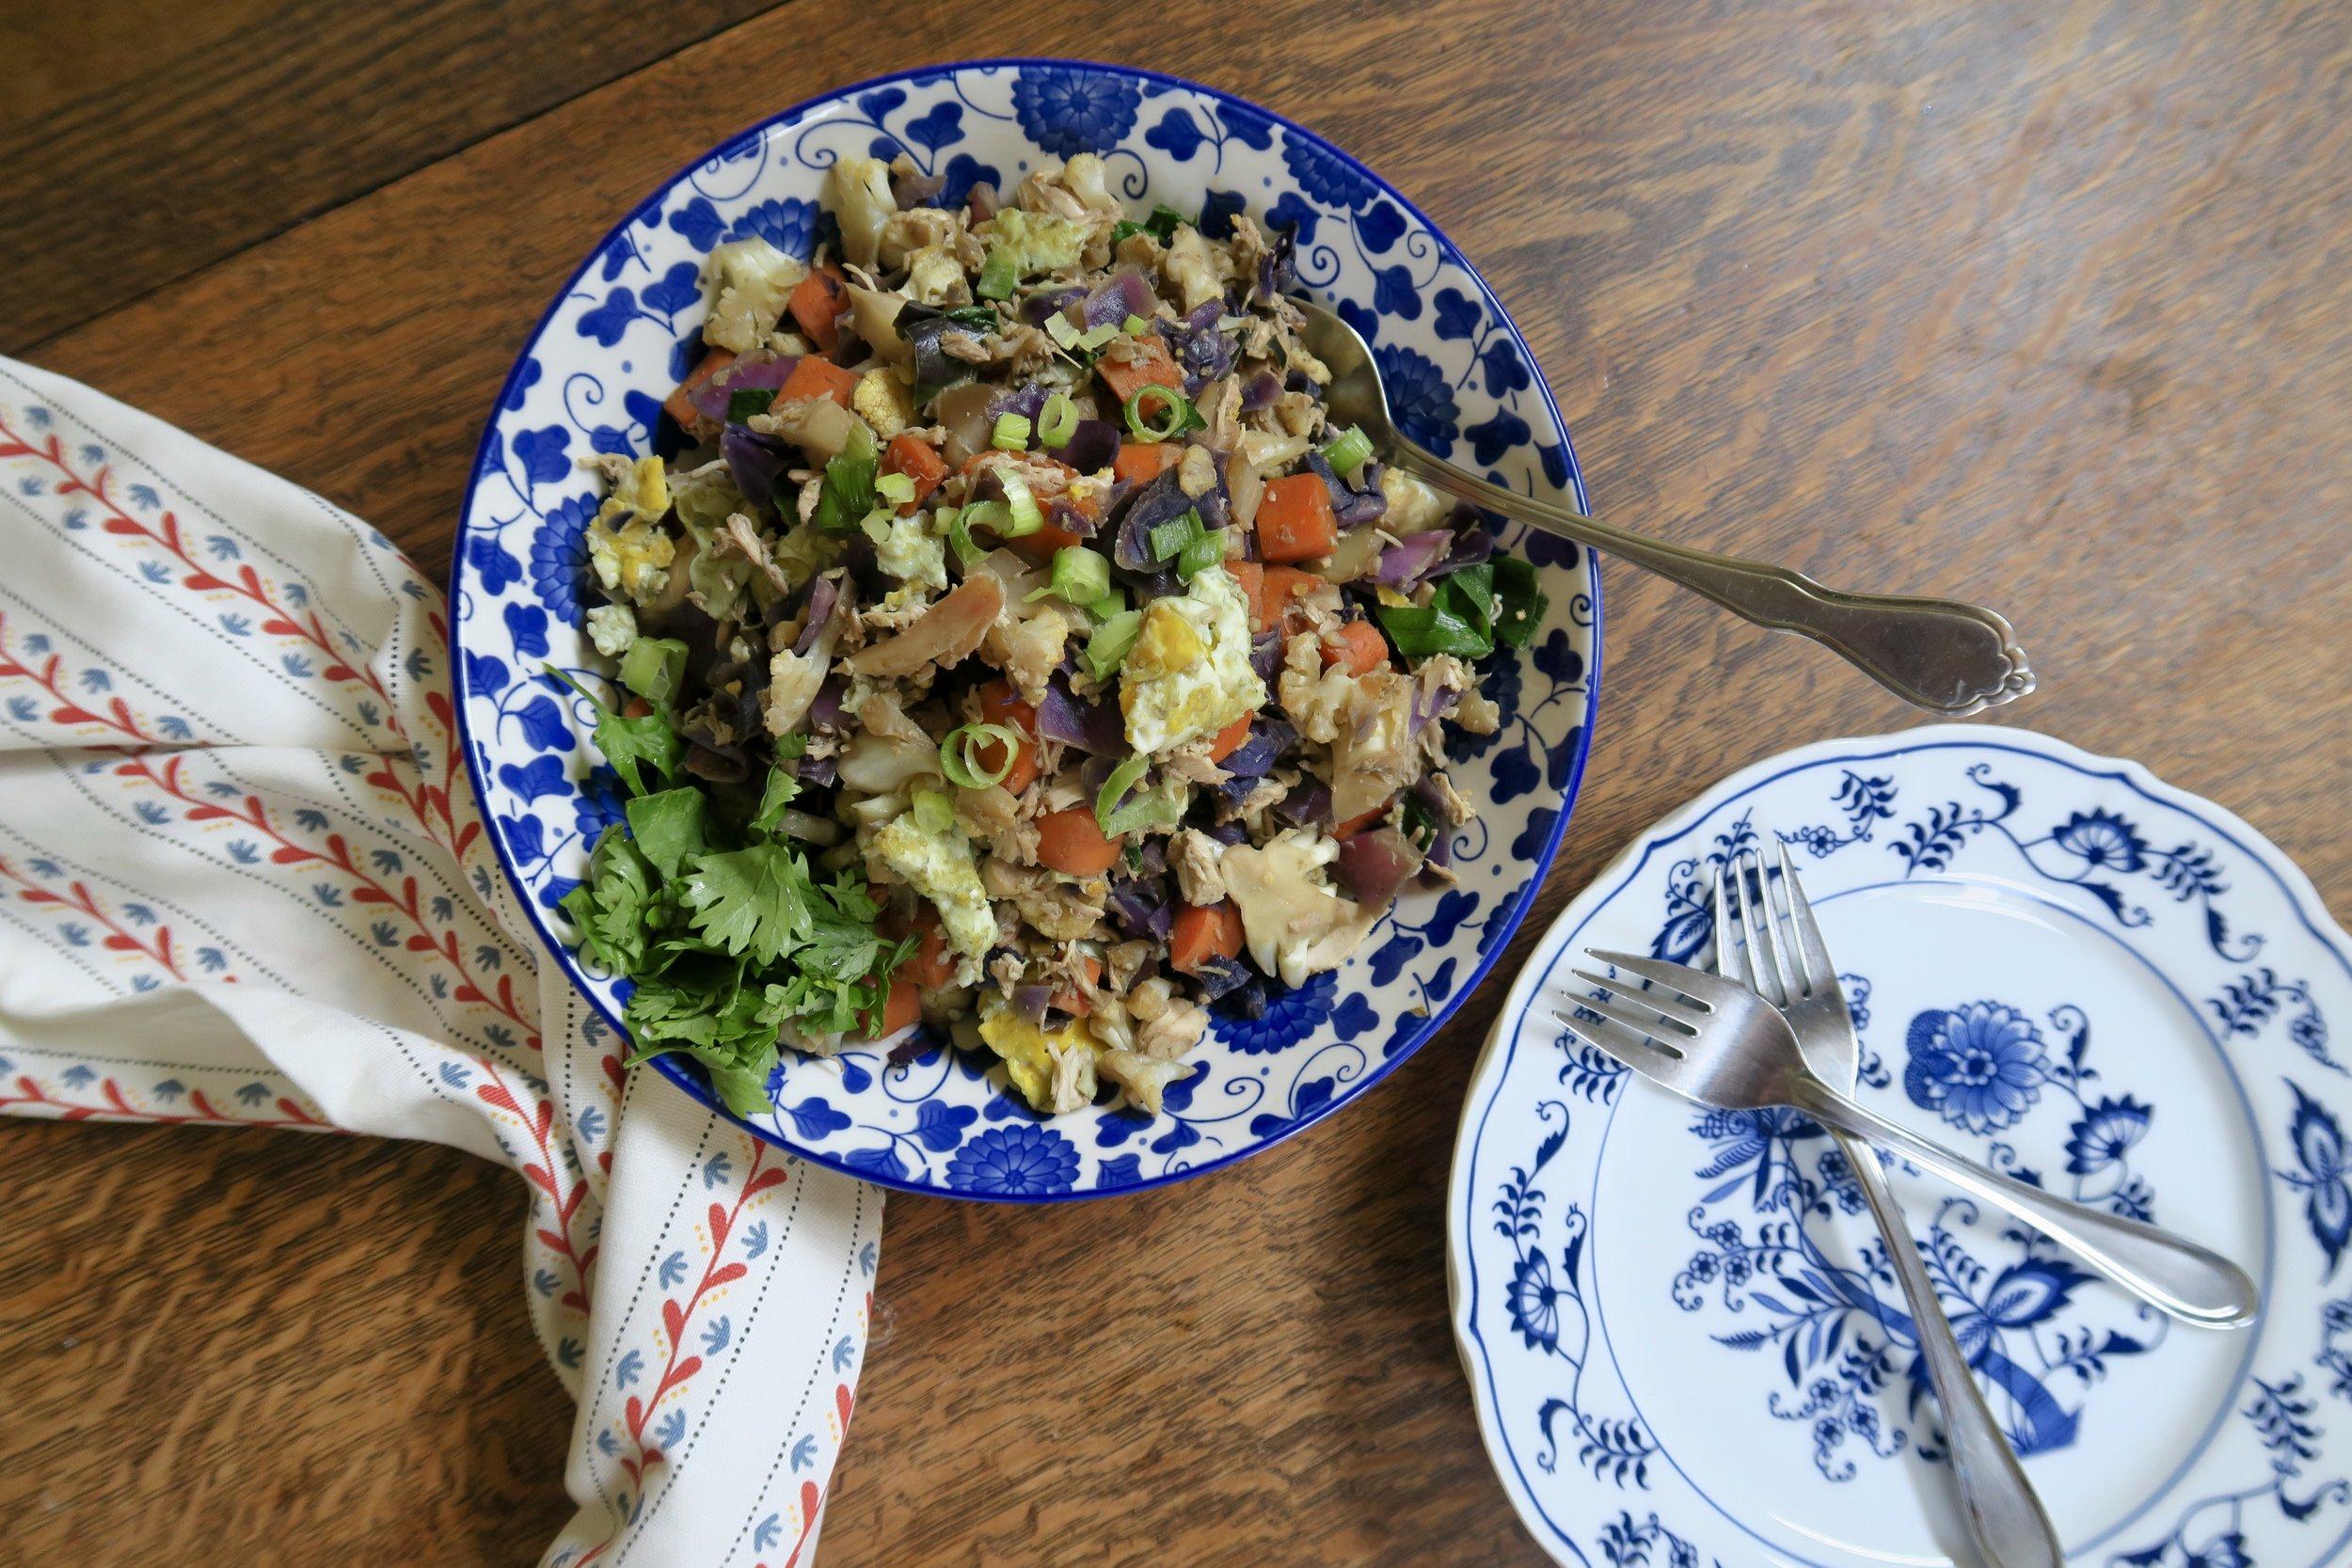 Cauliflower Rice, Lake Superior Kitchen, Whole30, Paleo